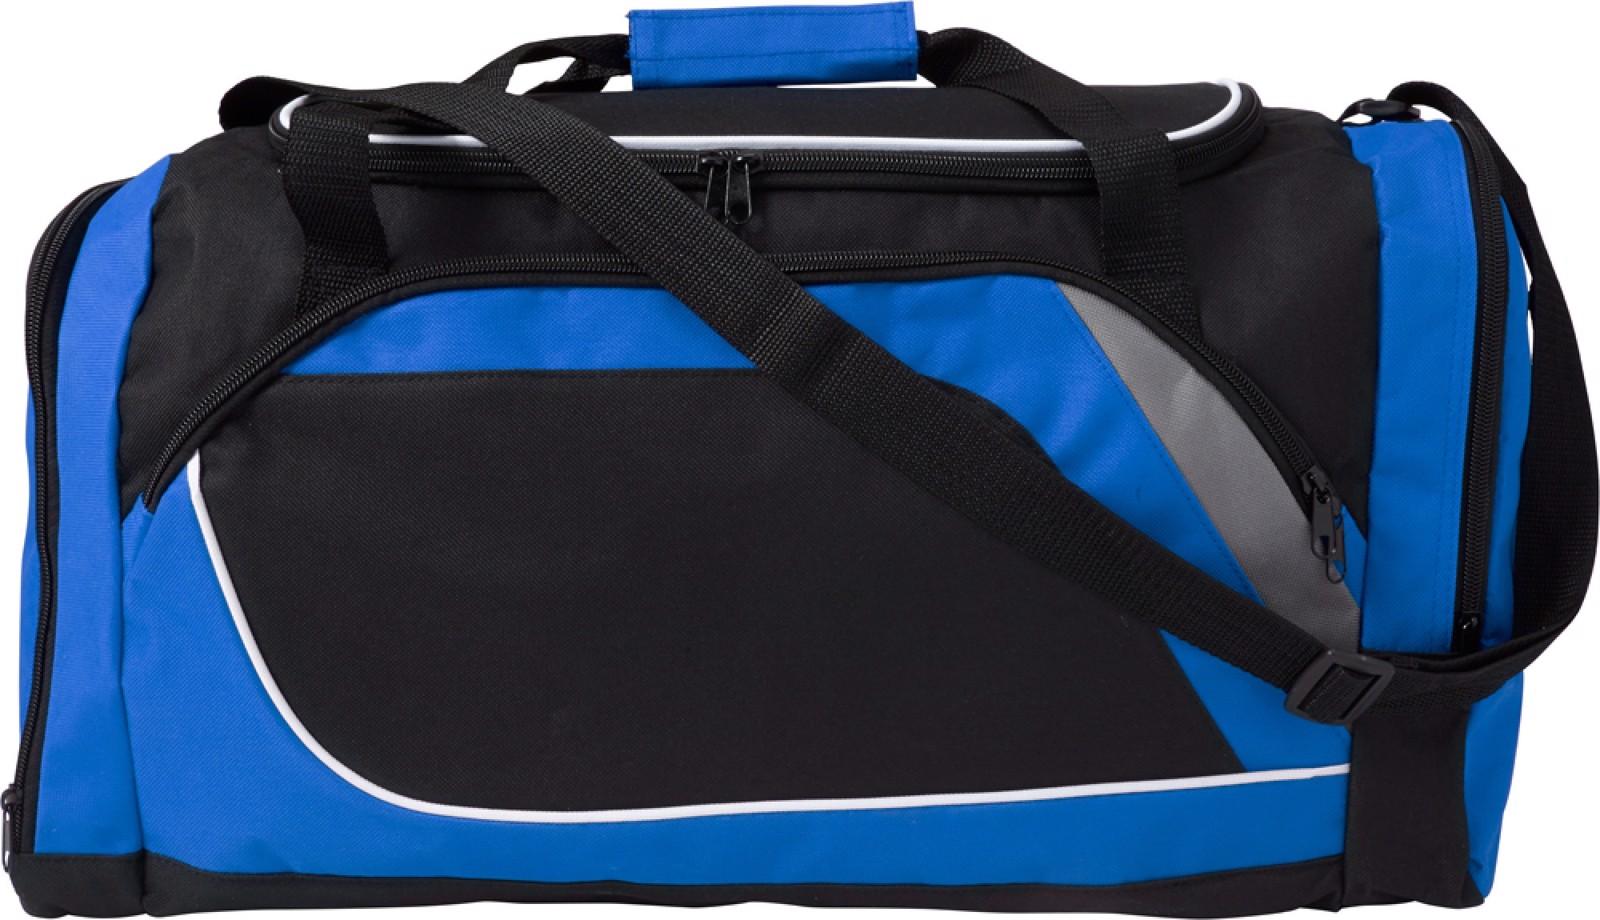 Polyester (600D) sports bag - Cobalt Blue